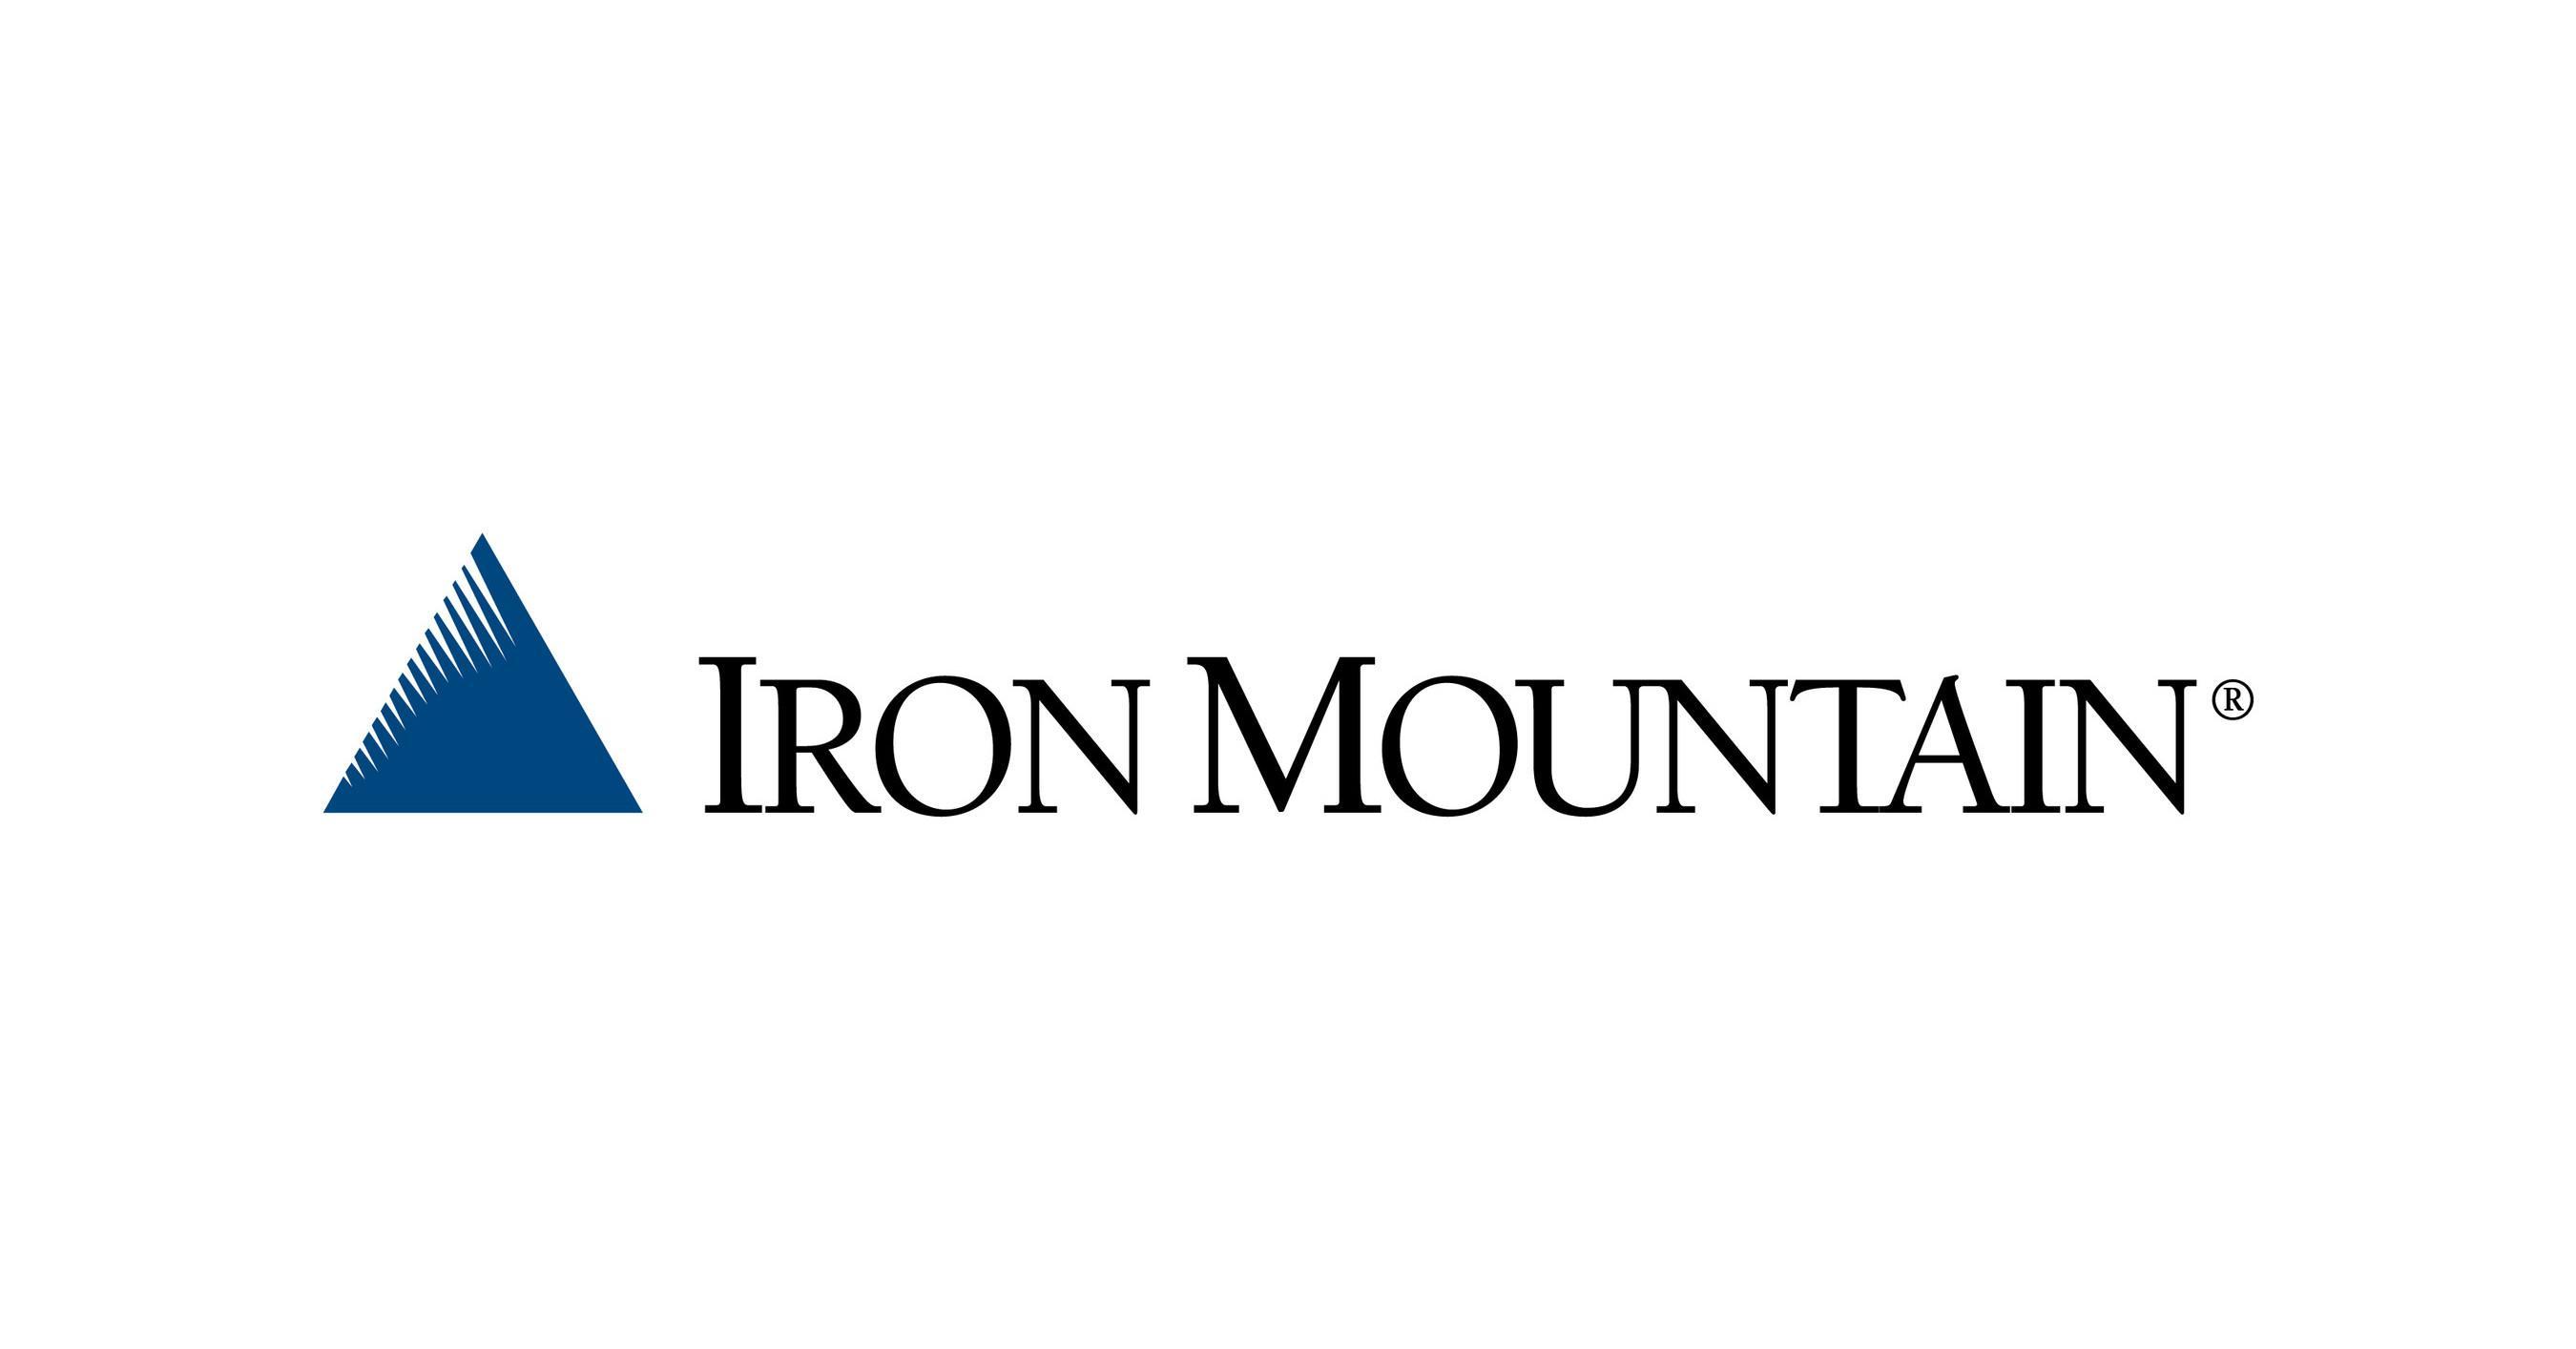 Ironmountain финансовый аналитик обучение